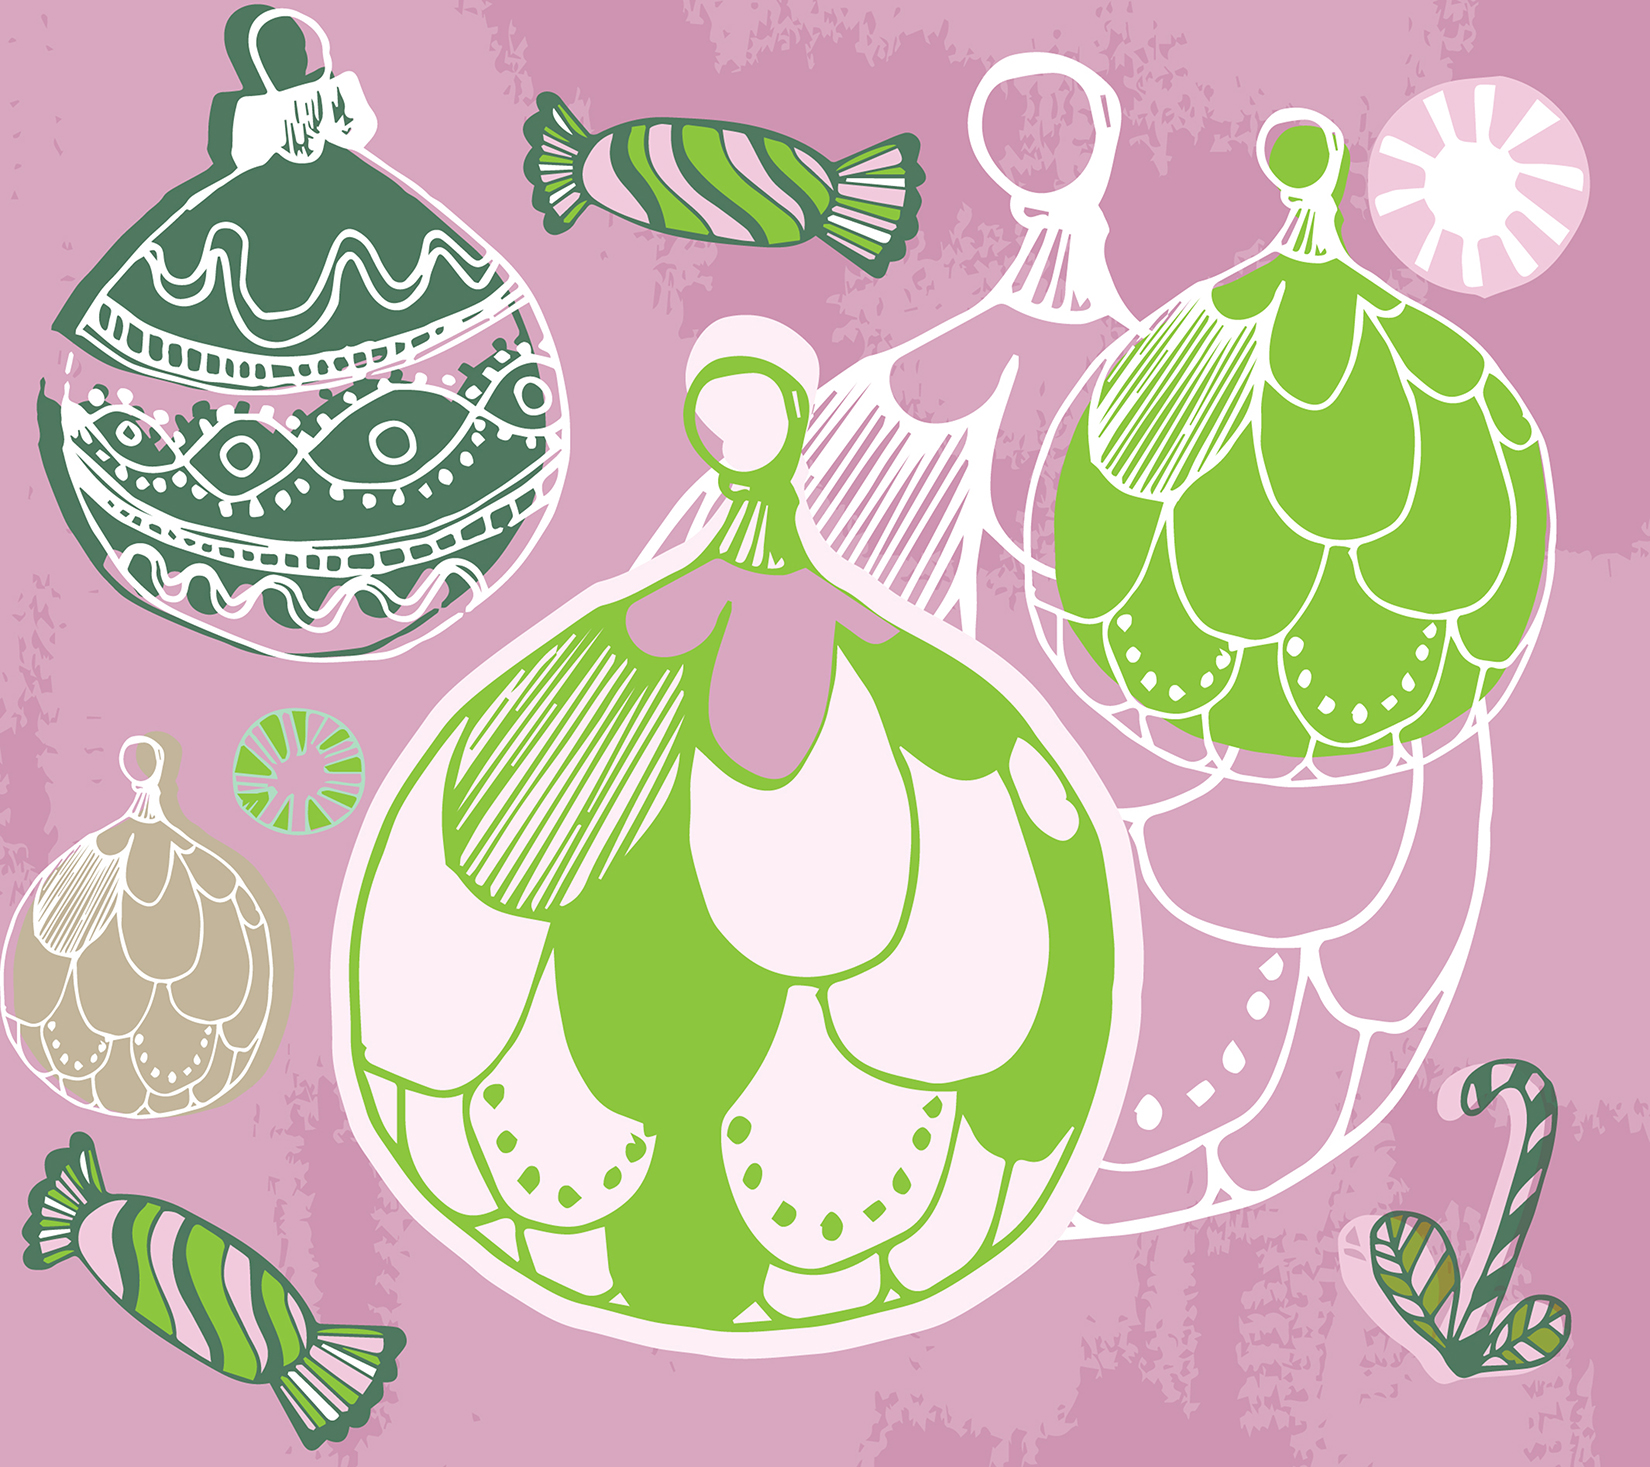 BB_Holiday_rnaments.jpg